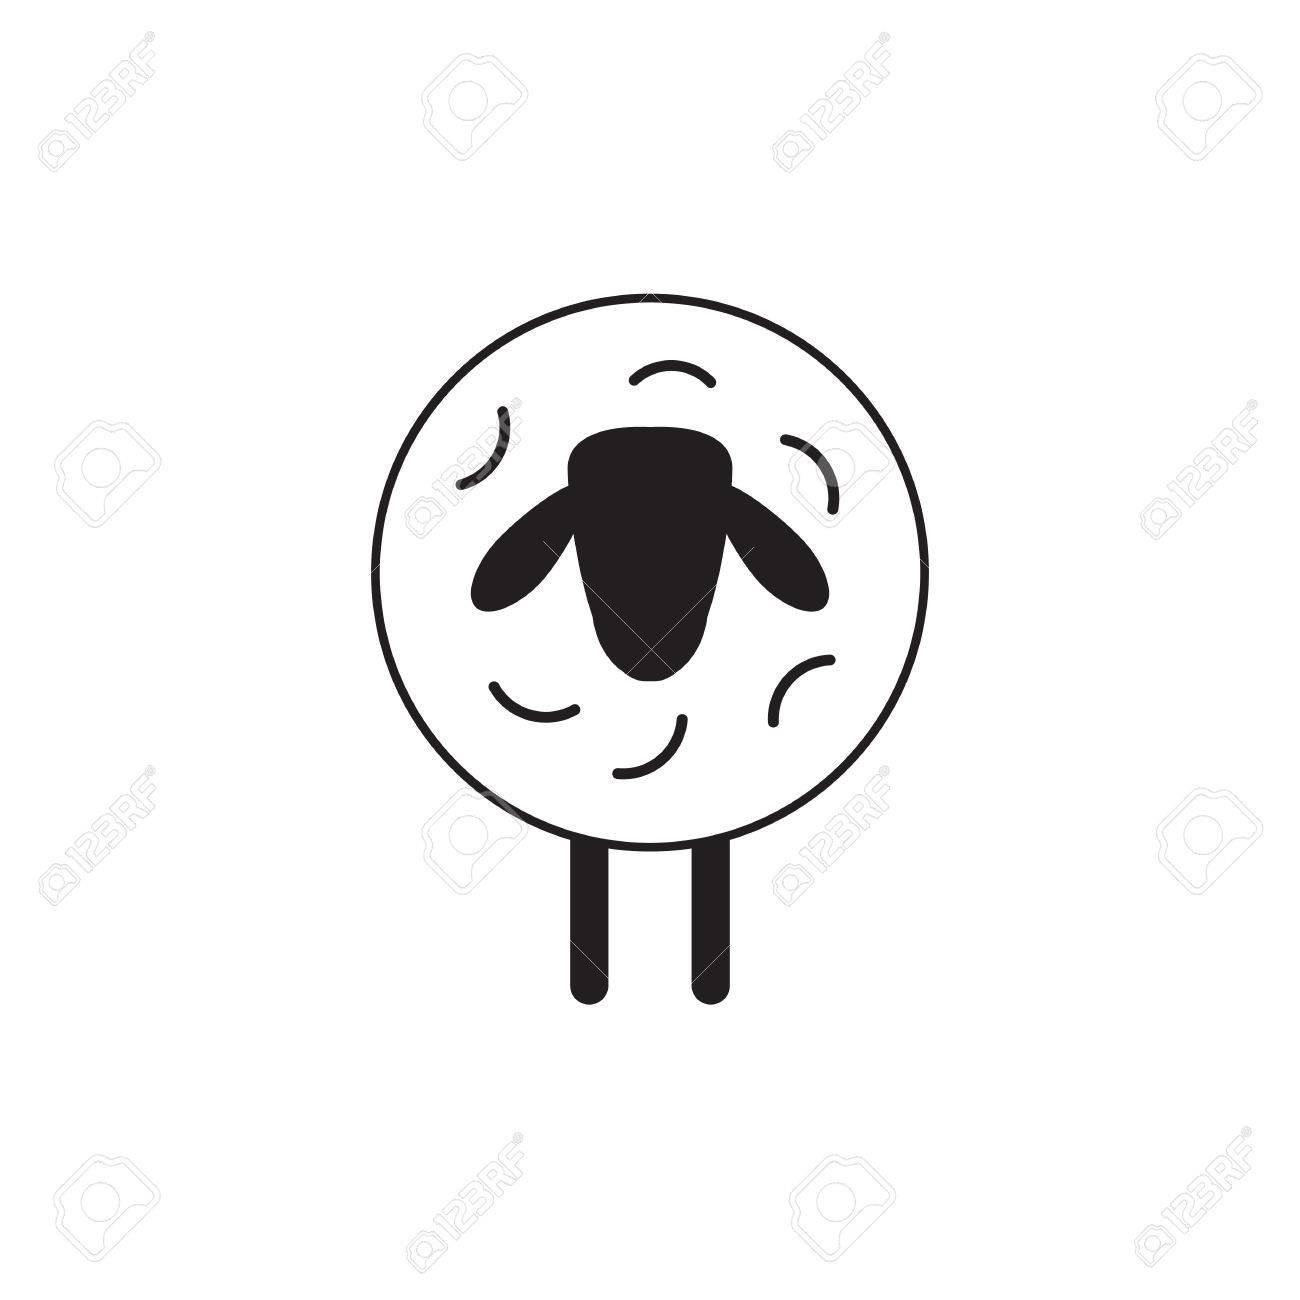 decoration trendy vector sheep or ram icon template pictogram modern emblem for - Dekoration Tren